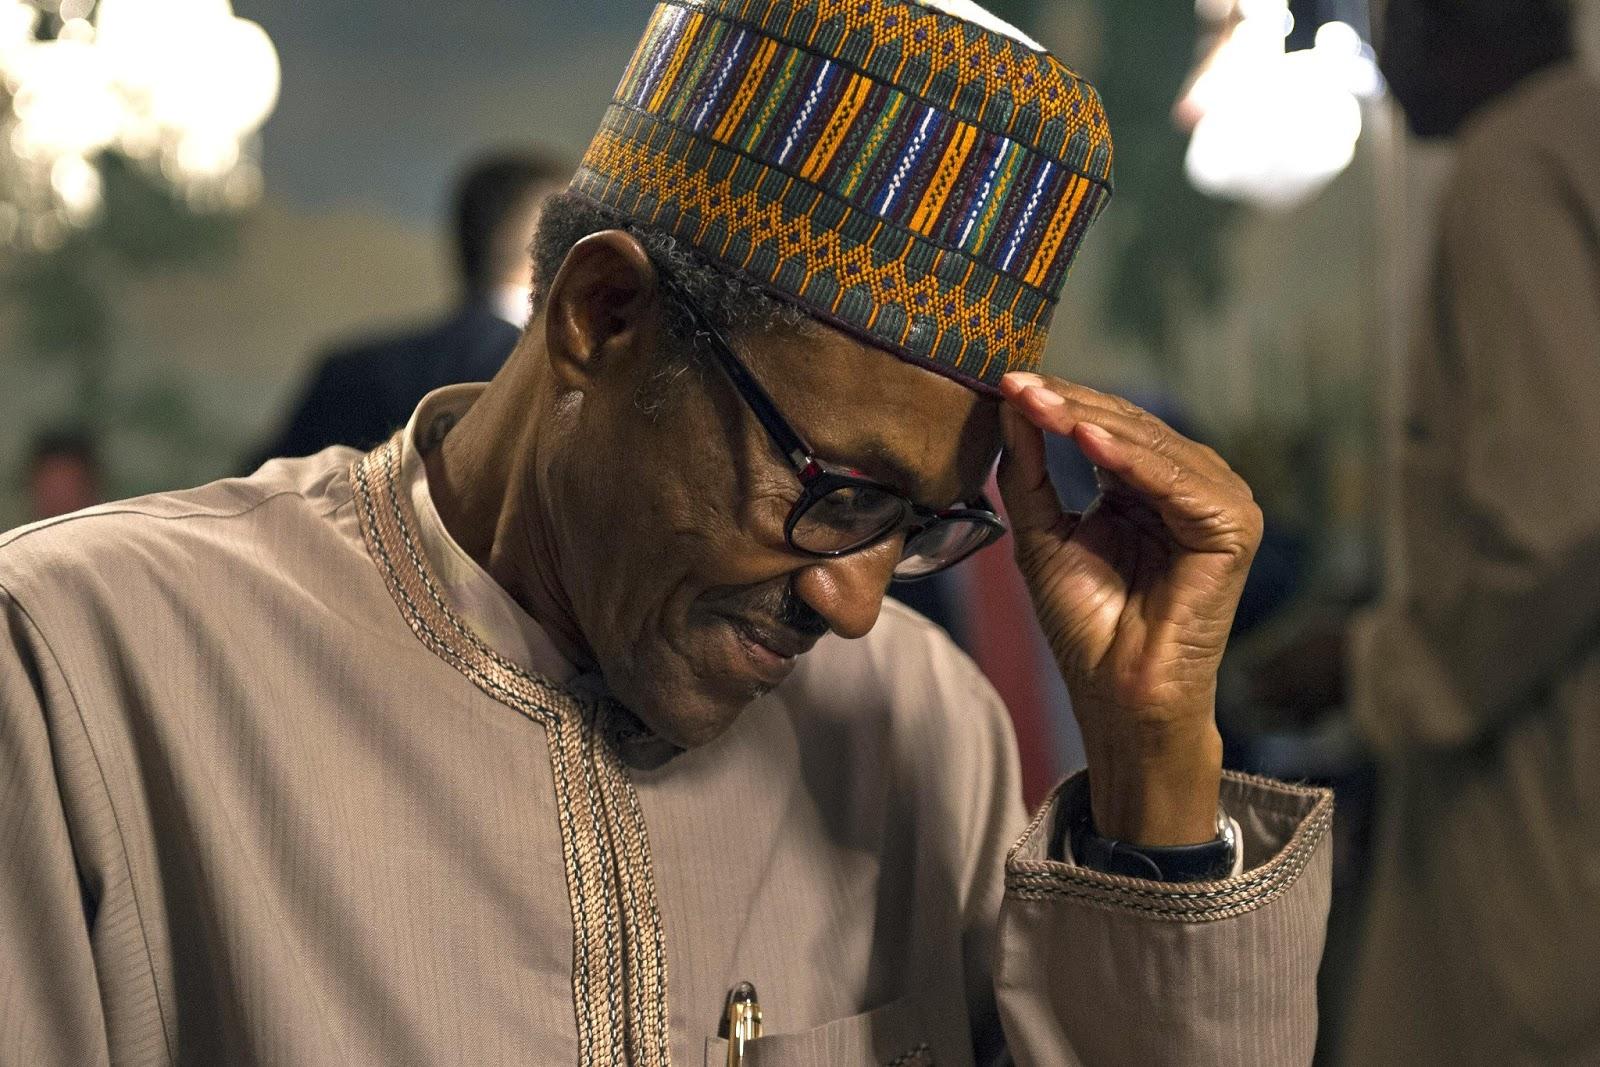 Nigeria's total debts